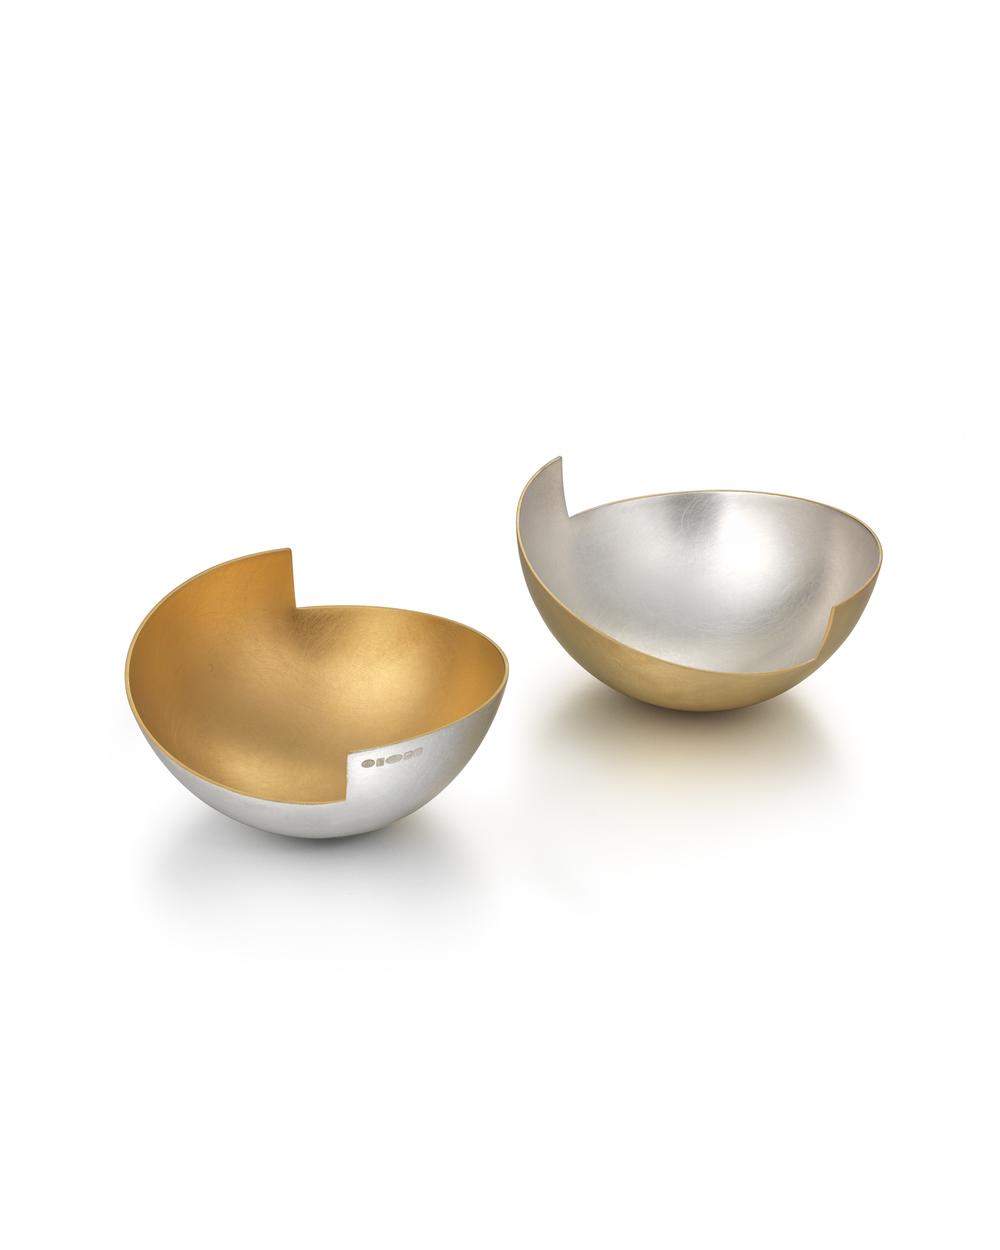 Salt & Pepper Split Bowls gilded britannia silver 4 x 8cm £1200 for both